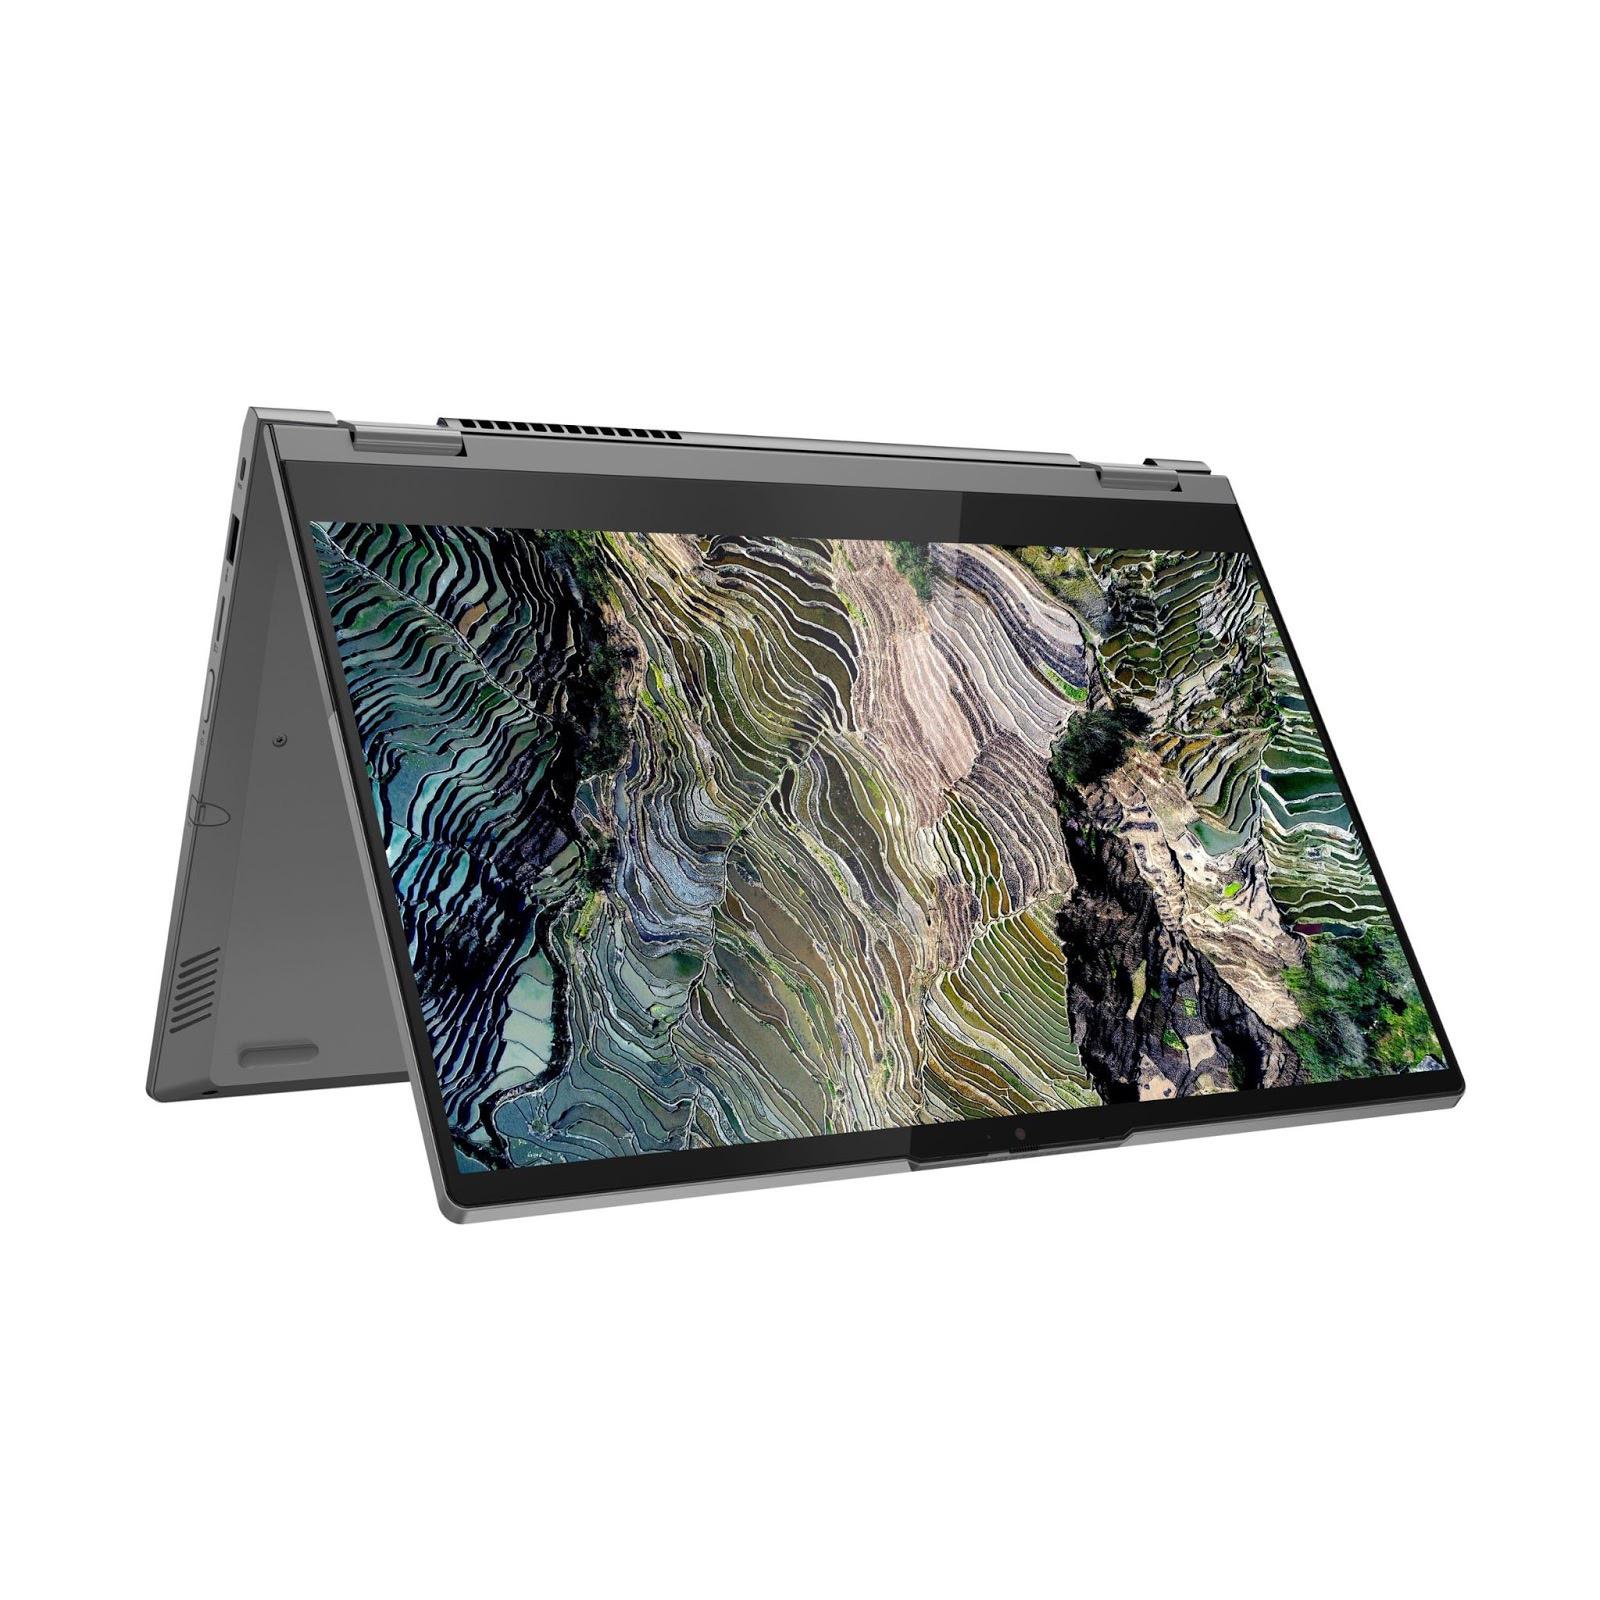 Фото 4. Ноутбук Lenovo ThinkBook 14s YOGA ITL Mineral Grey (20WE0000RU)